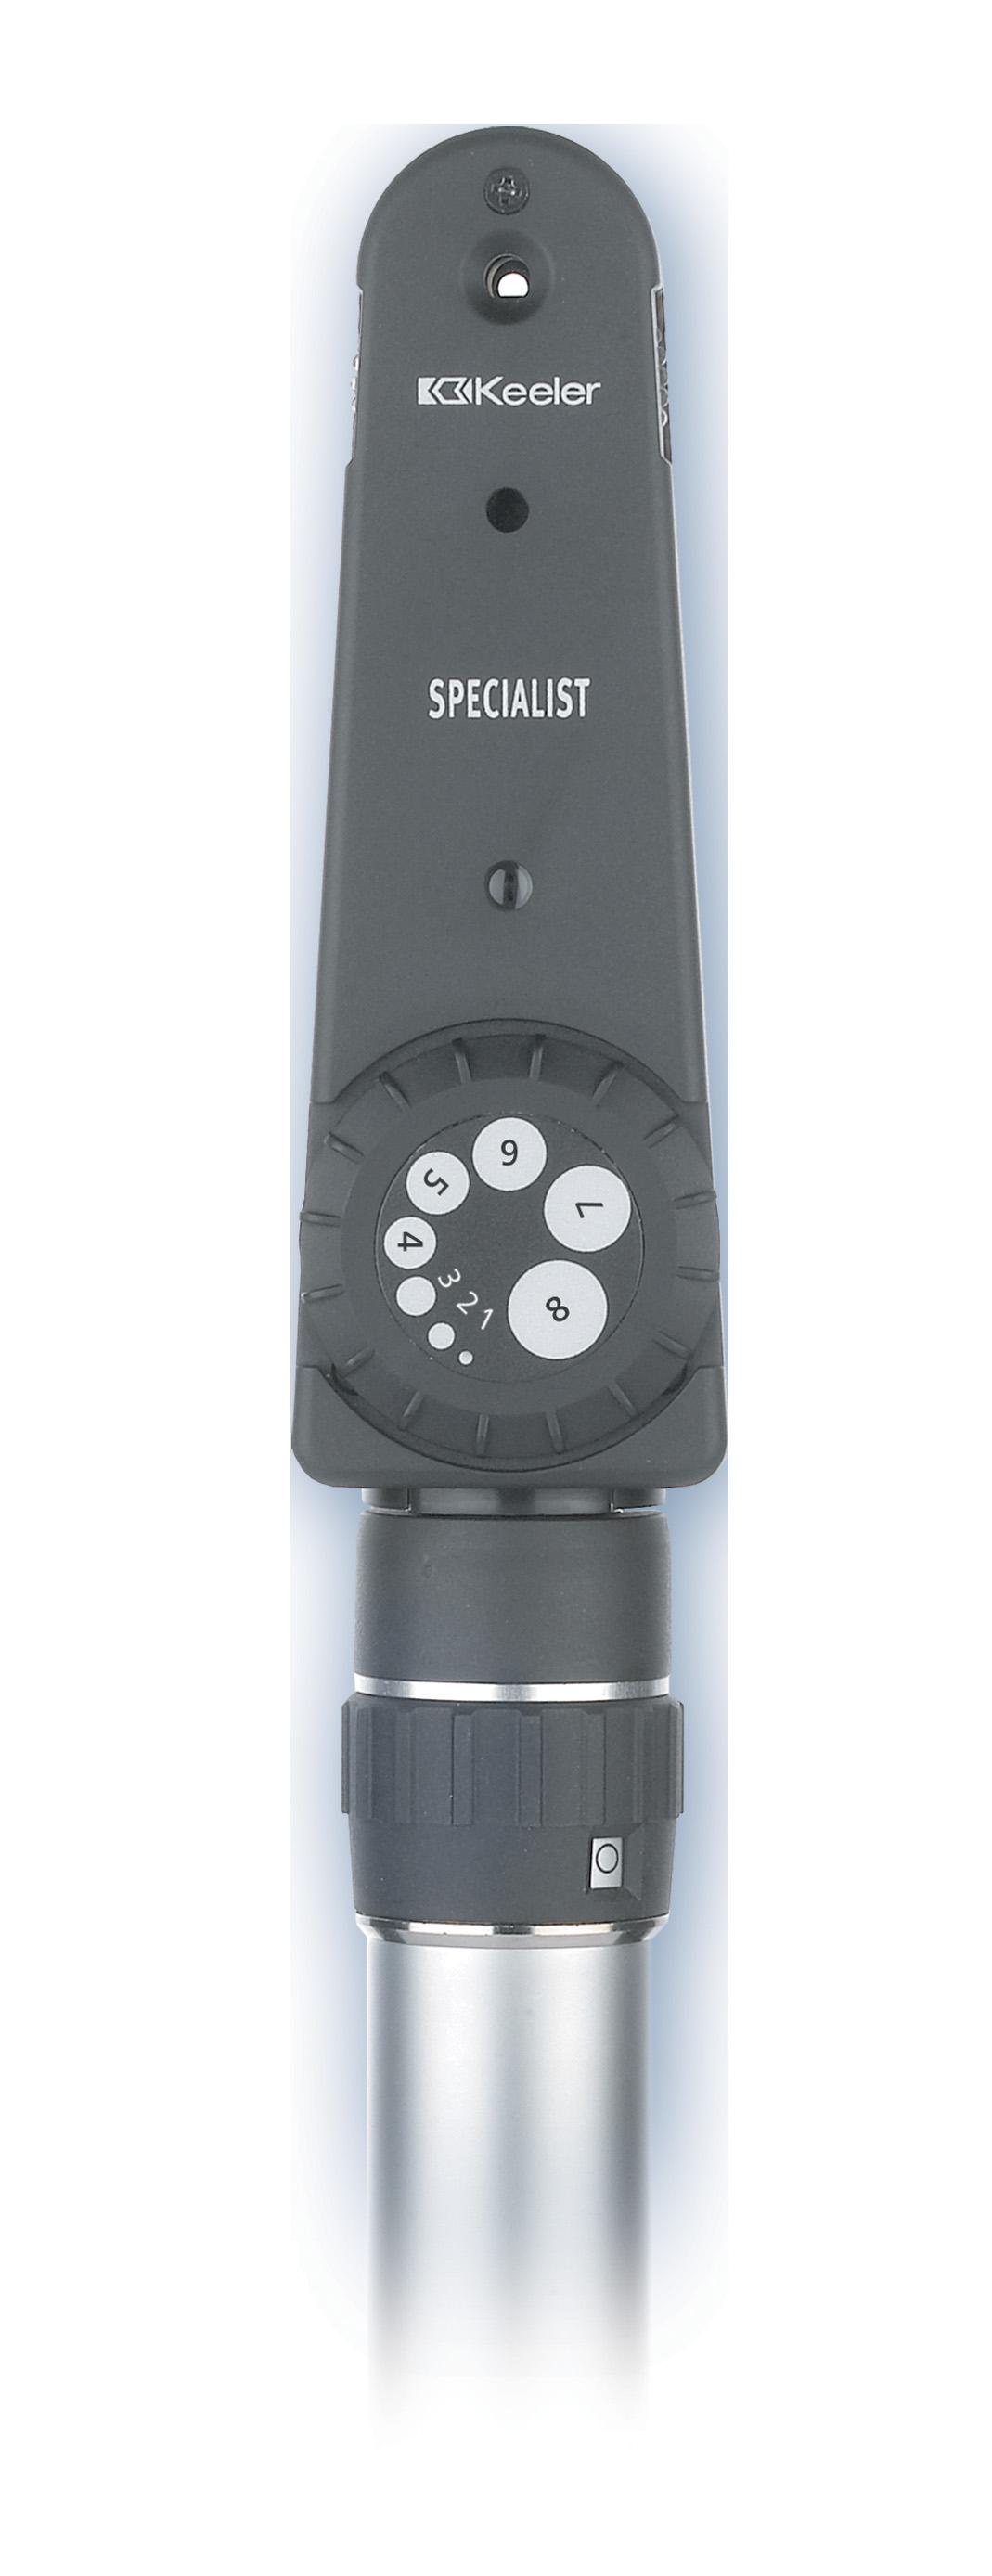 KEELER LED Specialist Ophthalmoscope 3.6V